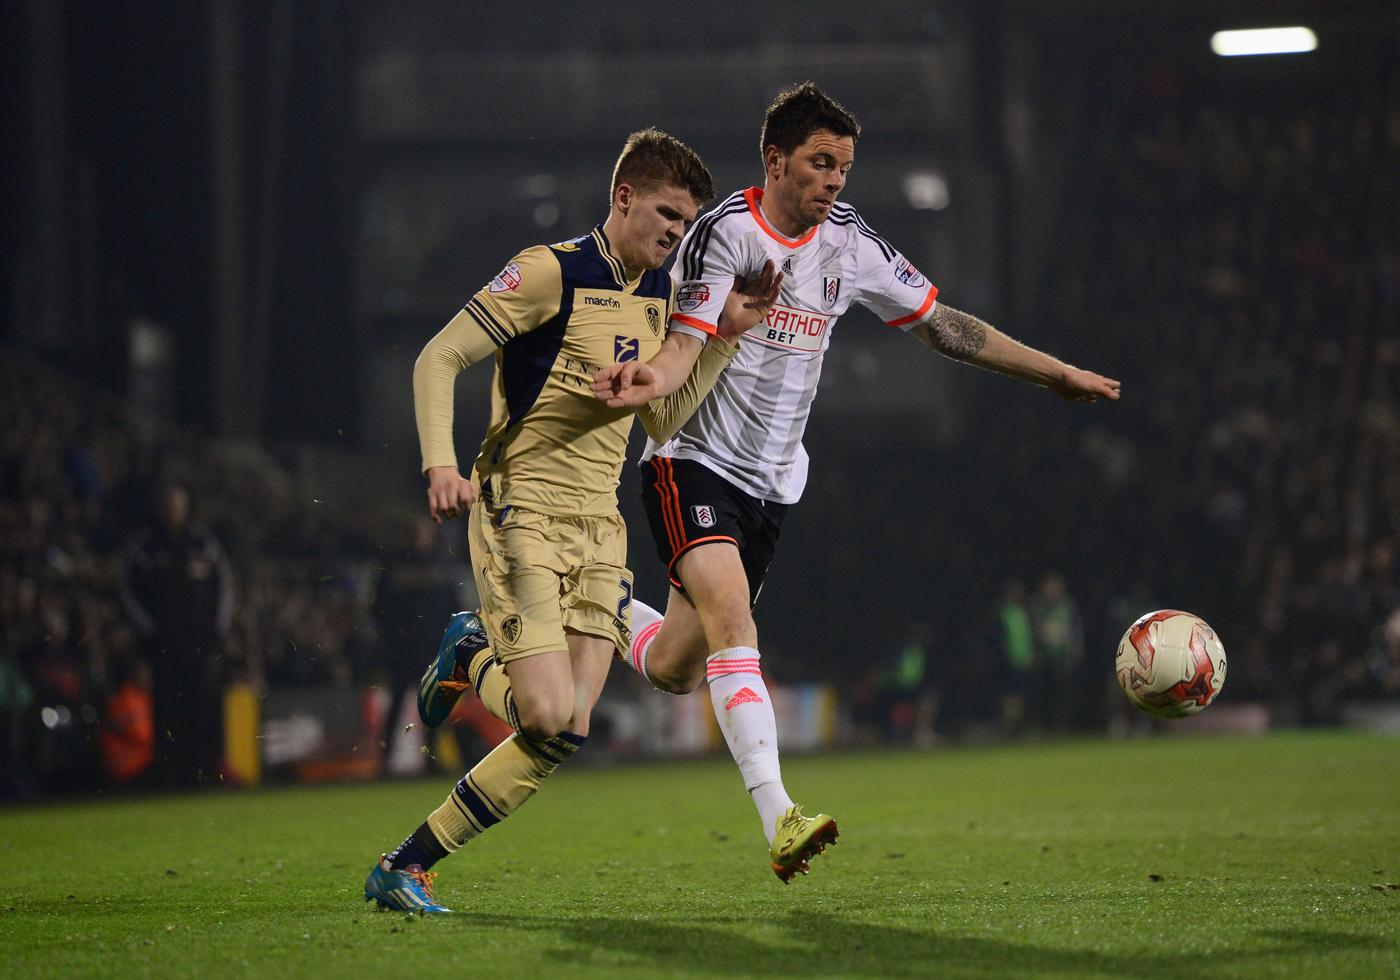 Could Leeds United star Sam Byram be the perfect transfer for Sunderland?